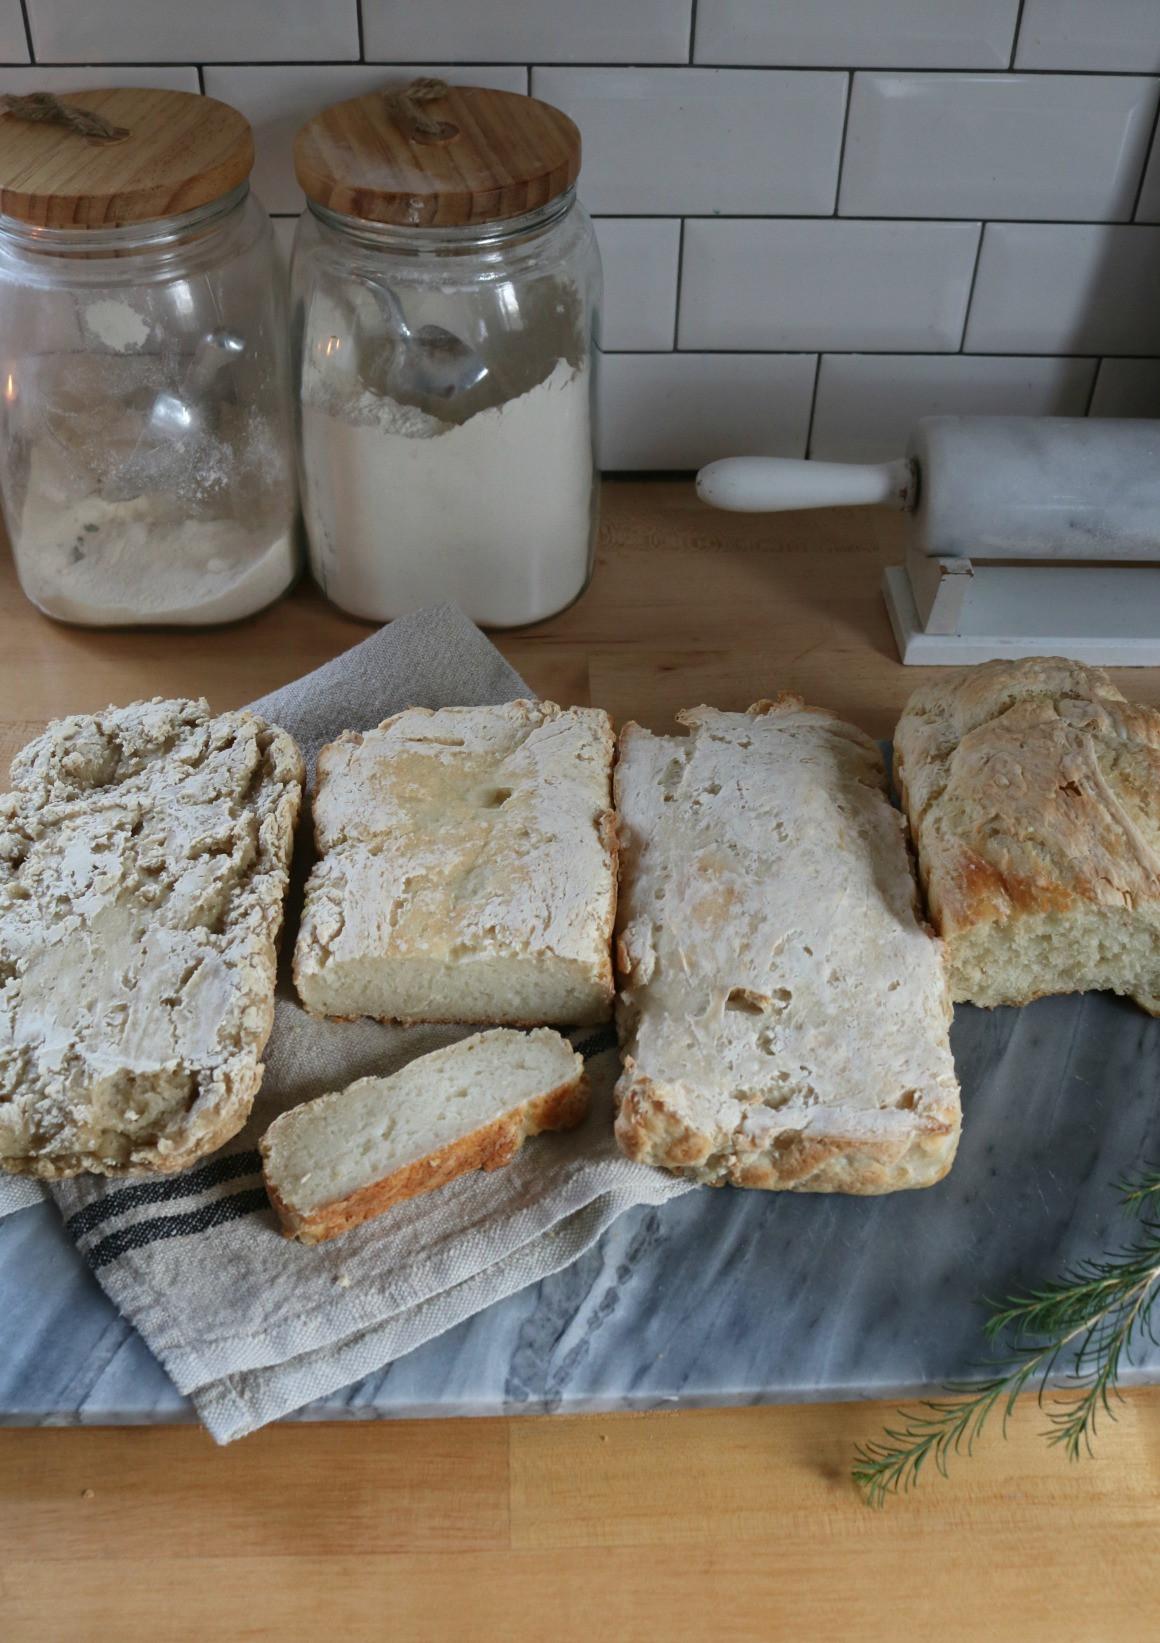 Gluten Free Bread Flour Recipe  EASIEST Gluten Free Bread with the BEST Gluten Free Flour